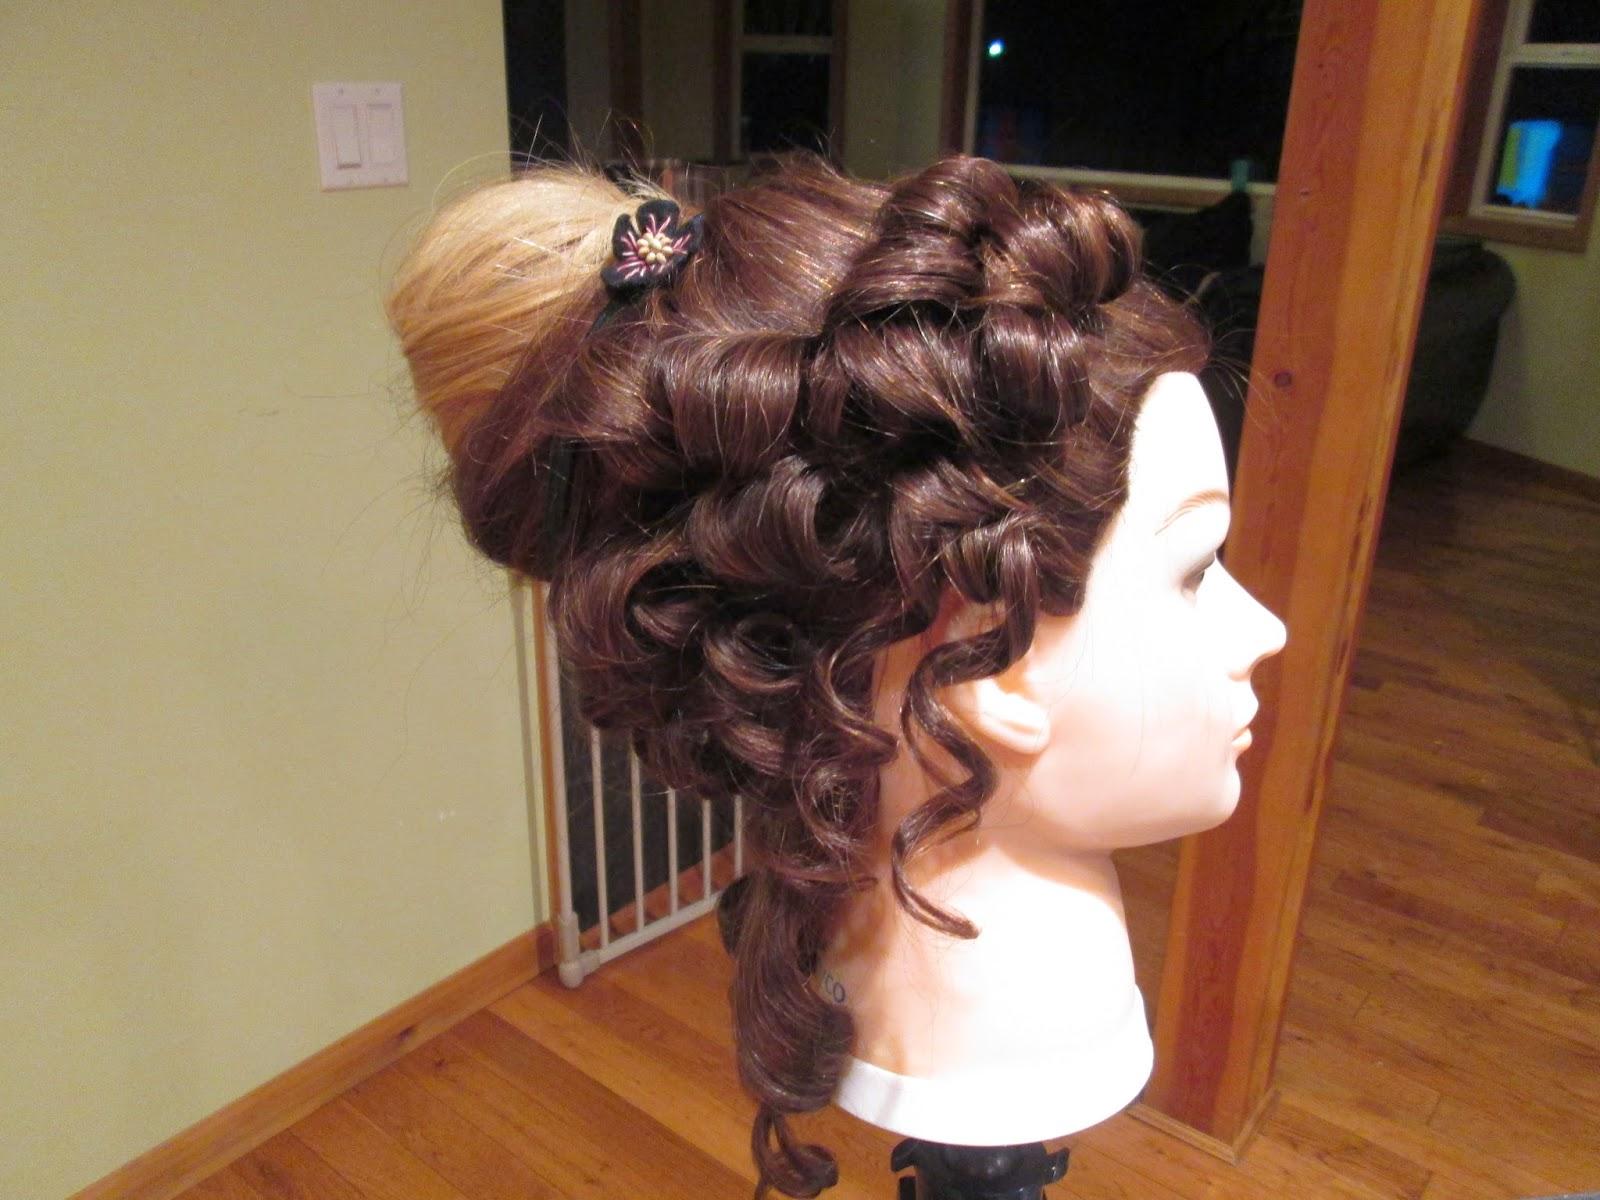 vendela's hair studio: masquerade ball hairstyle